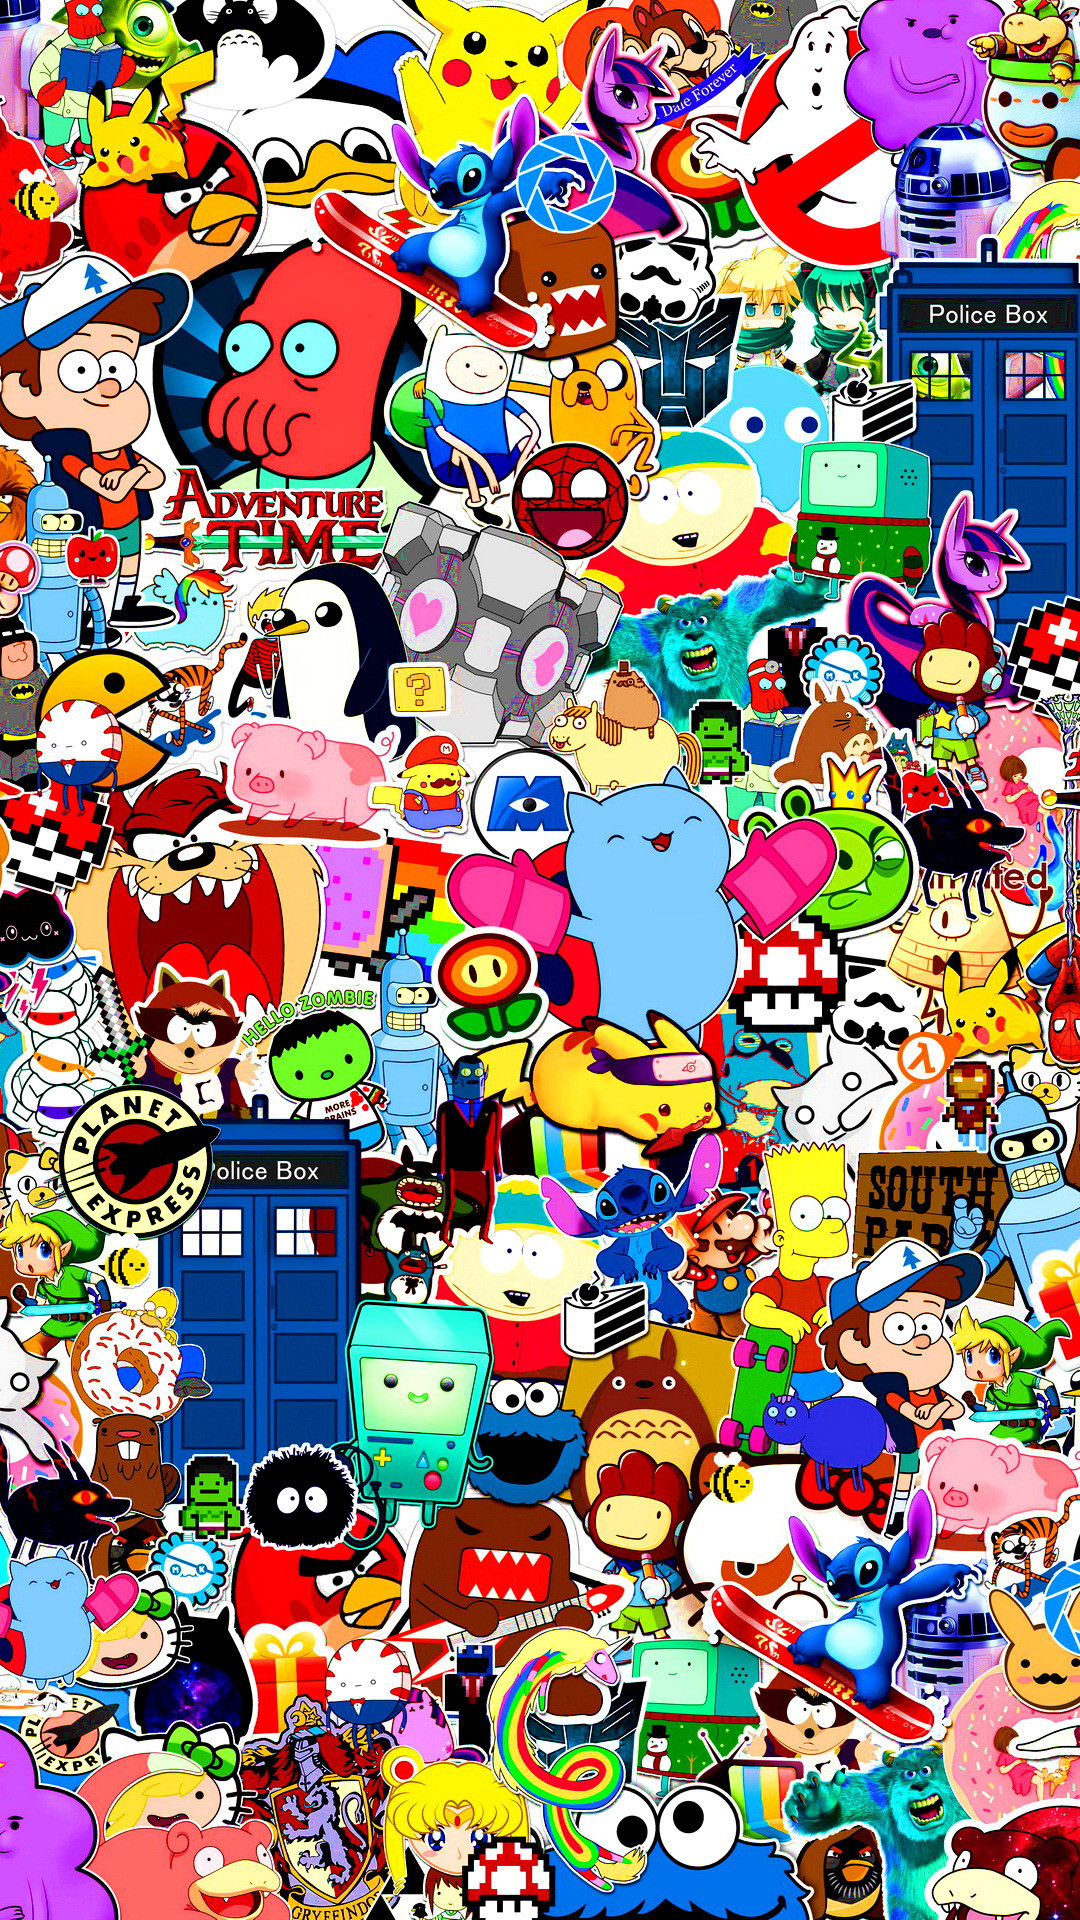 Dope Emoji Wallpaper (63+ images) | 1080 x 1920 jpeg 1410kB